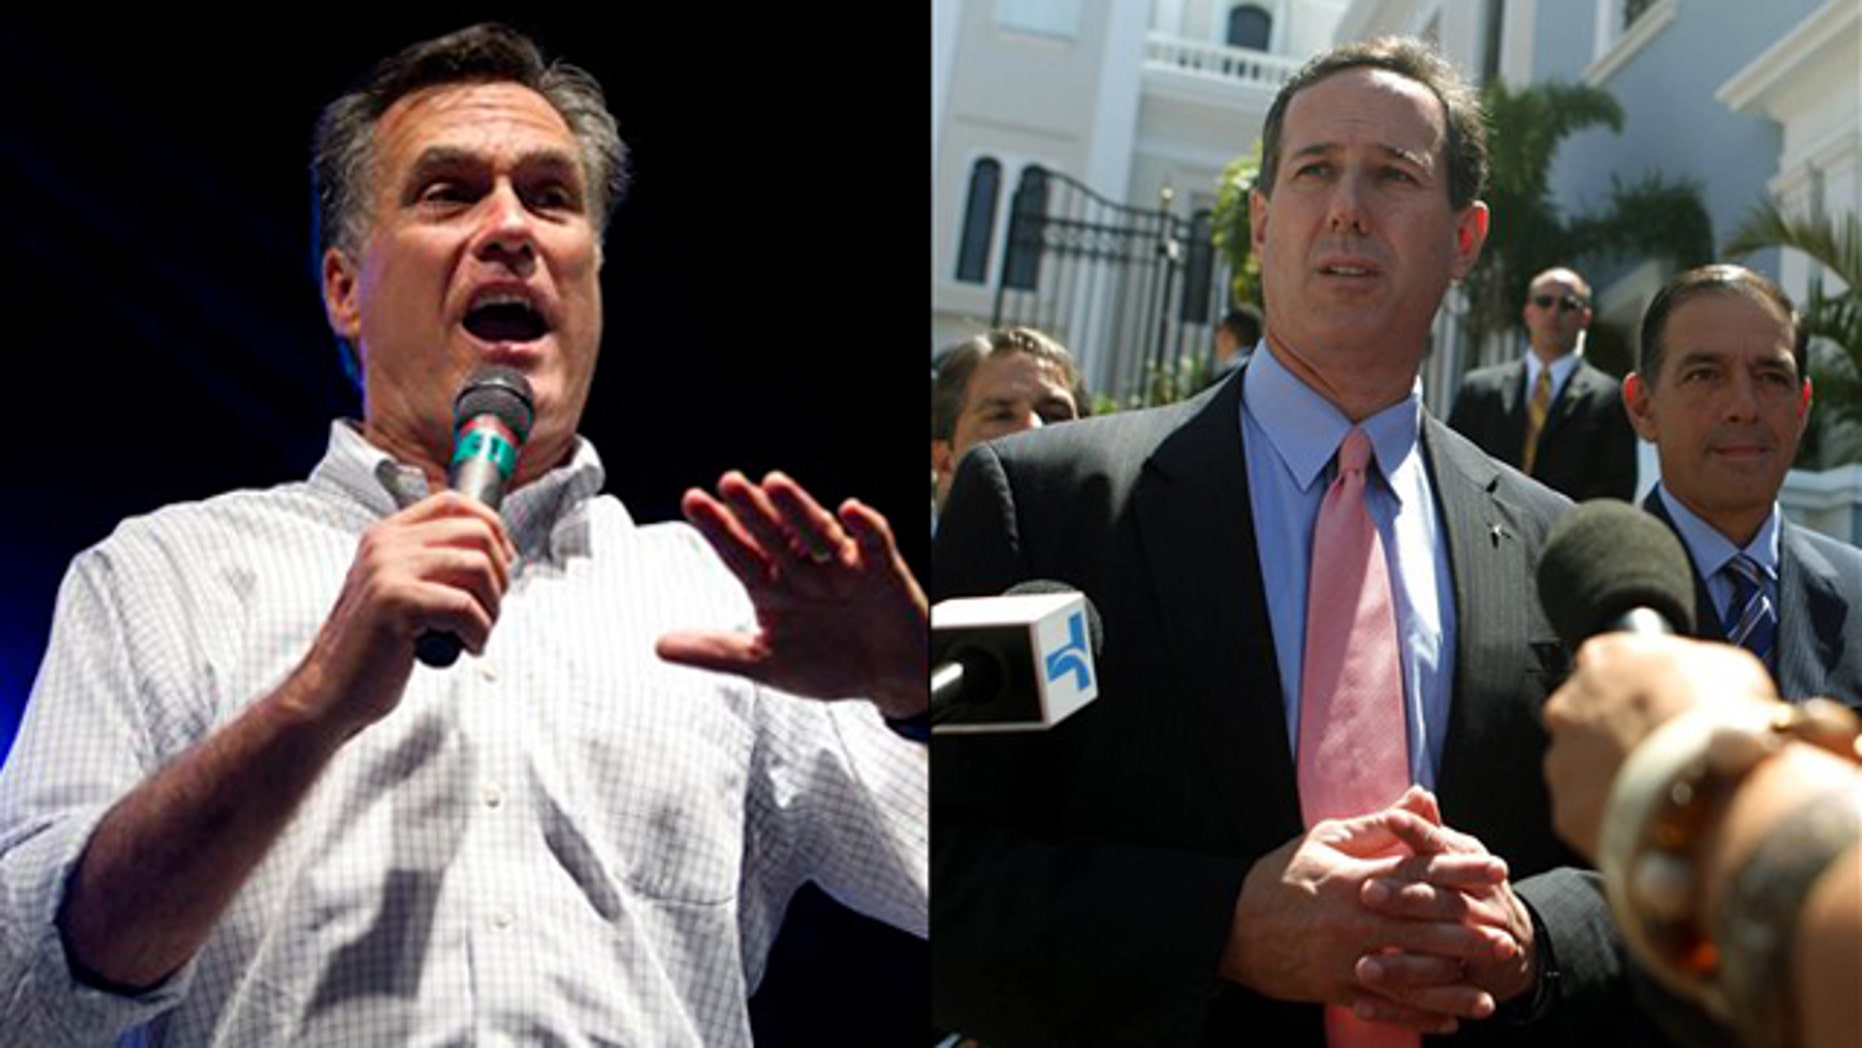 Mitt Romney, left, and Rick Santorum are shown campaigning in Puerto Rico.